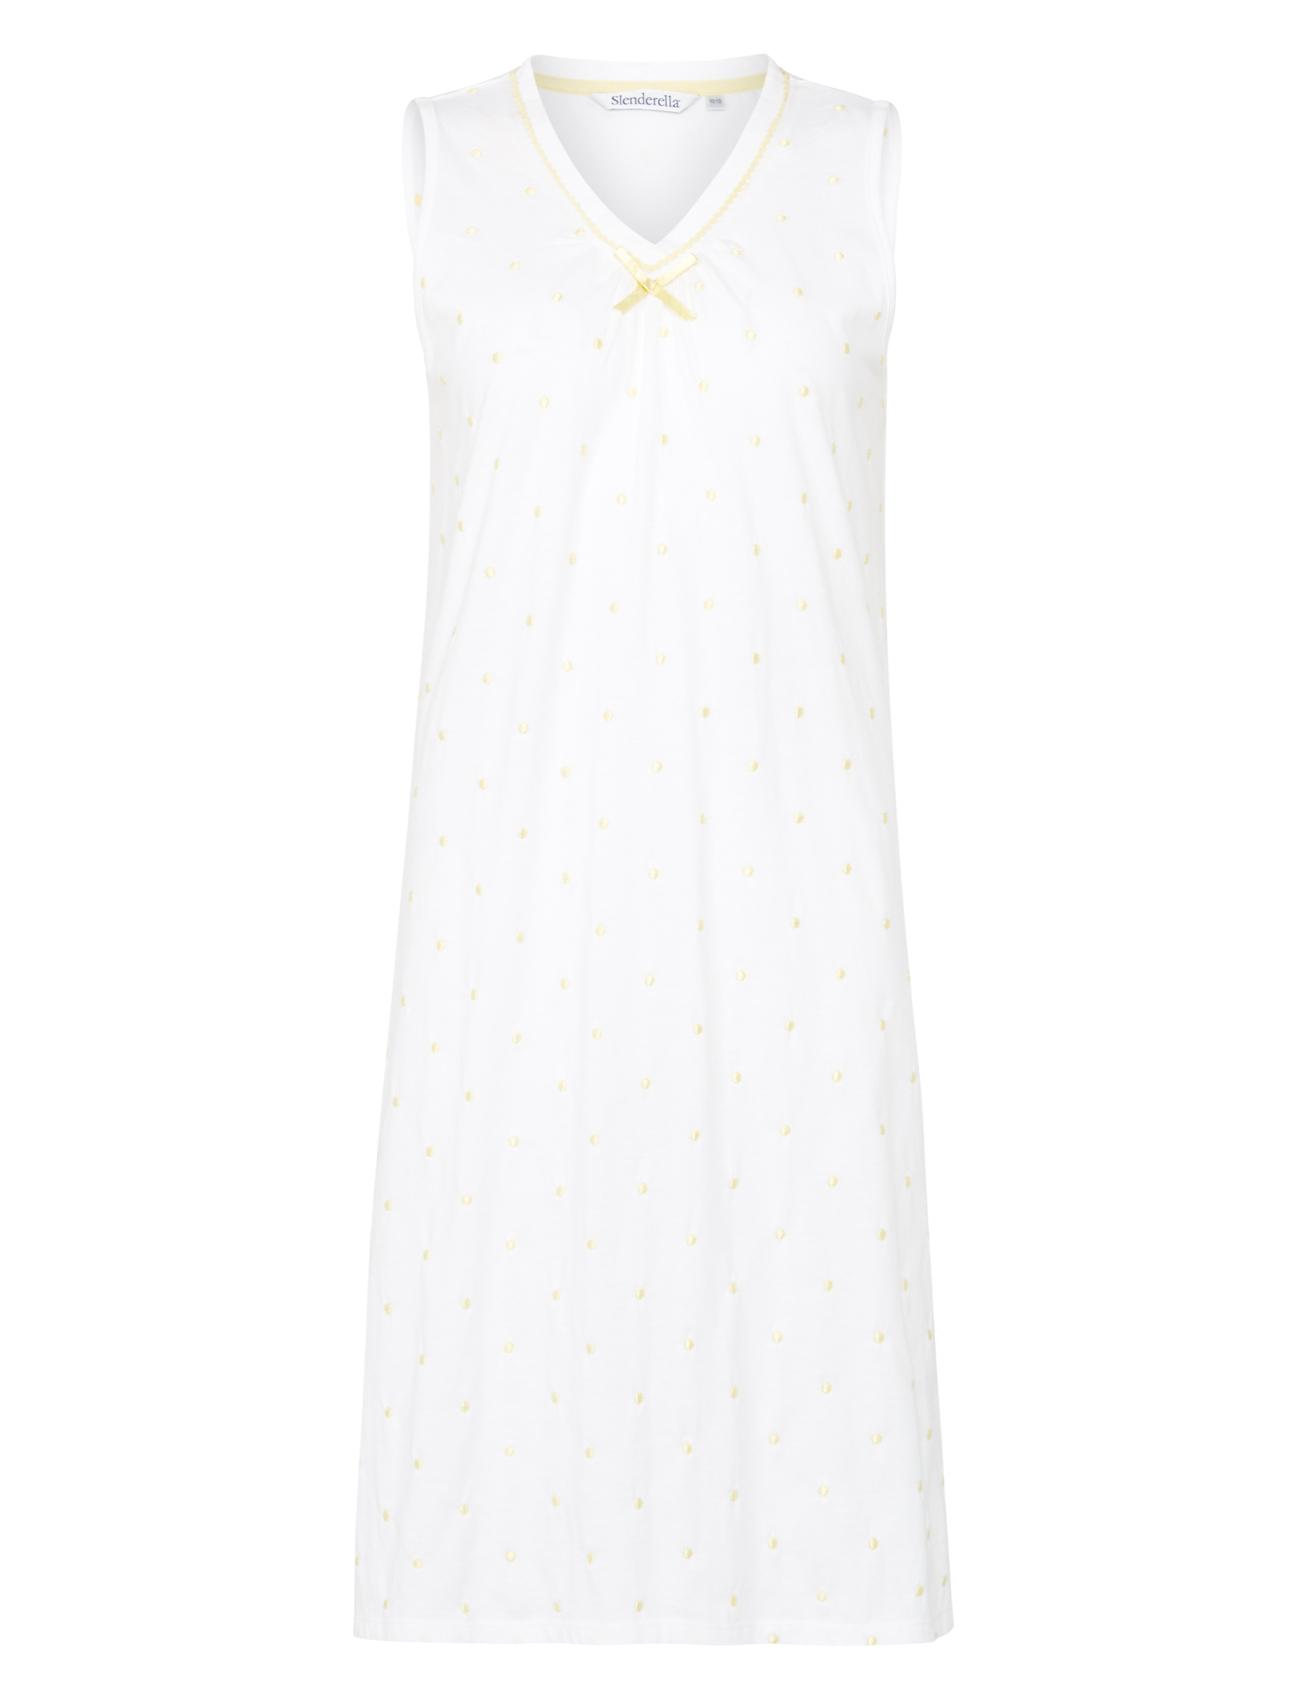 Nightdress 100% Cotton Dobby Dot Sleeveless Nightgown Womens Slenderella  Nightie 66cfe488d